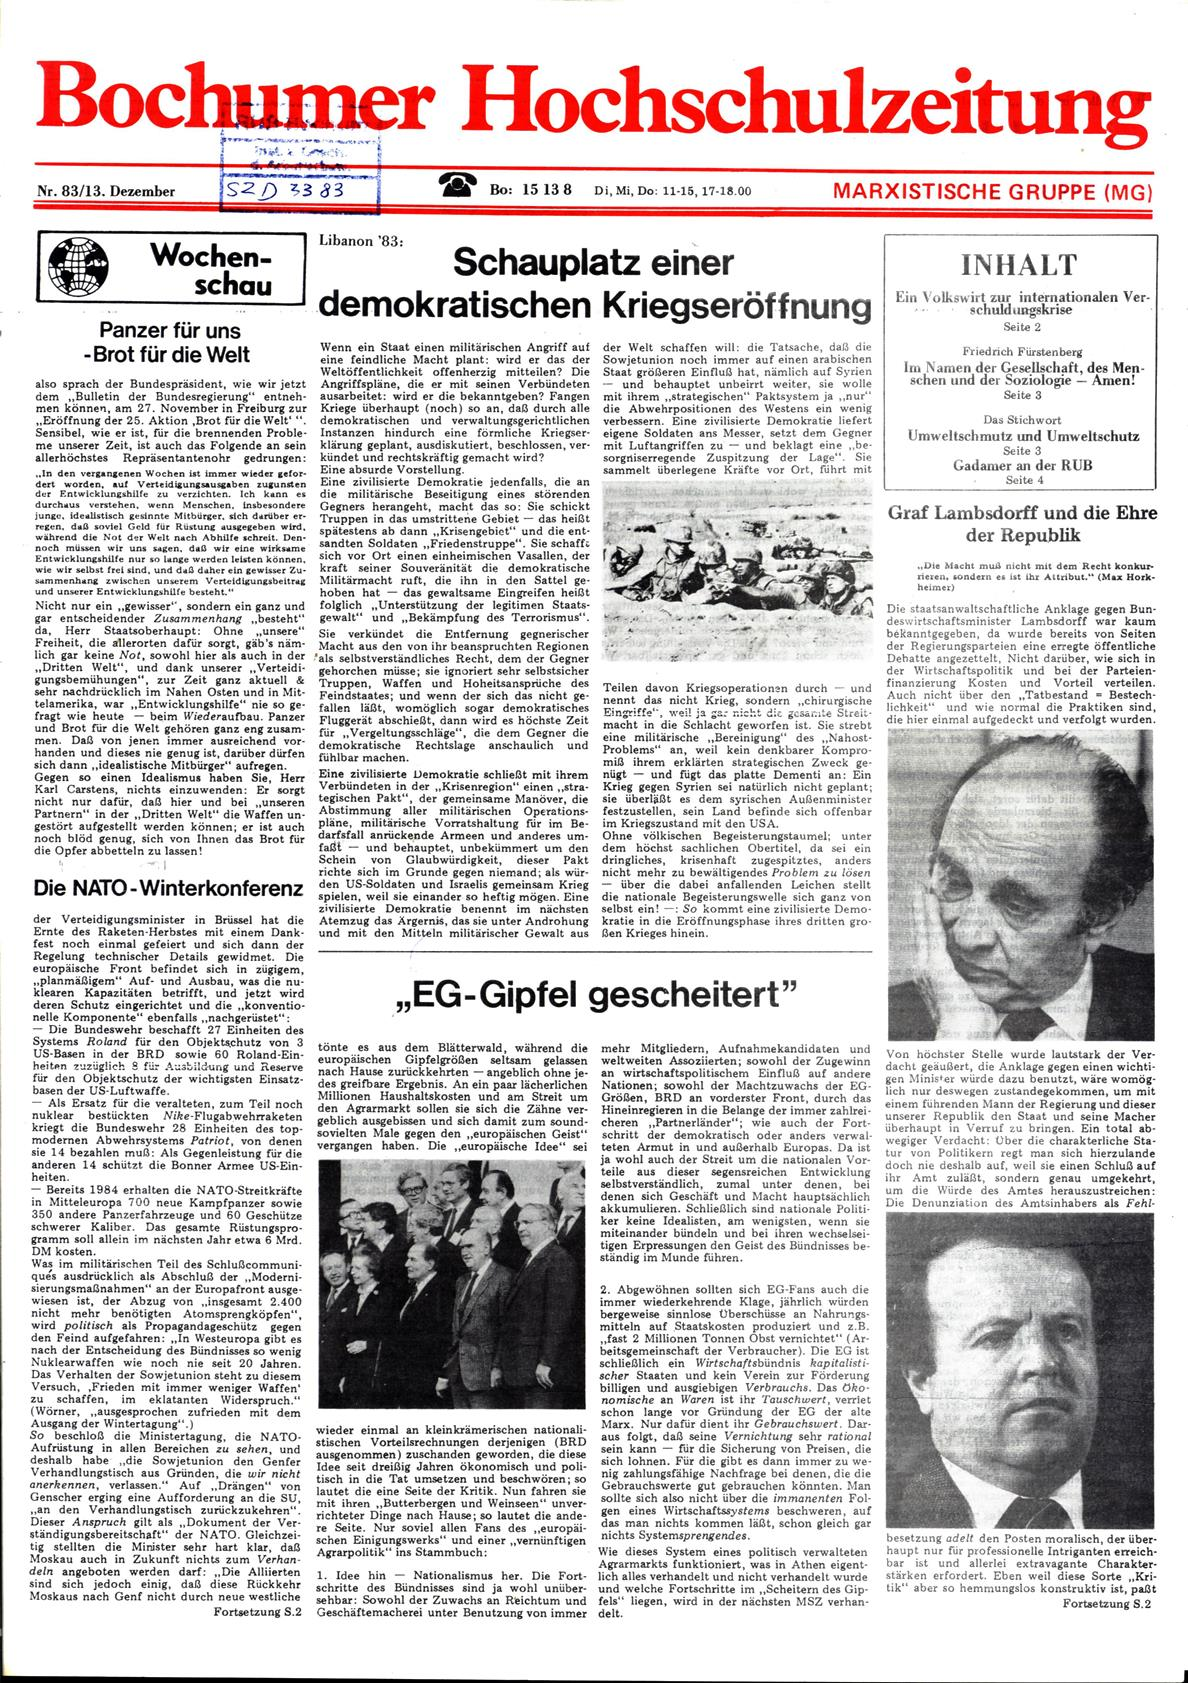 Bochum_BHZ_19831213_083_001